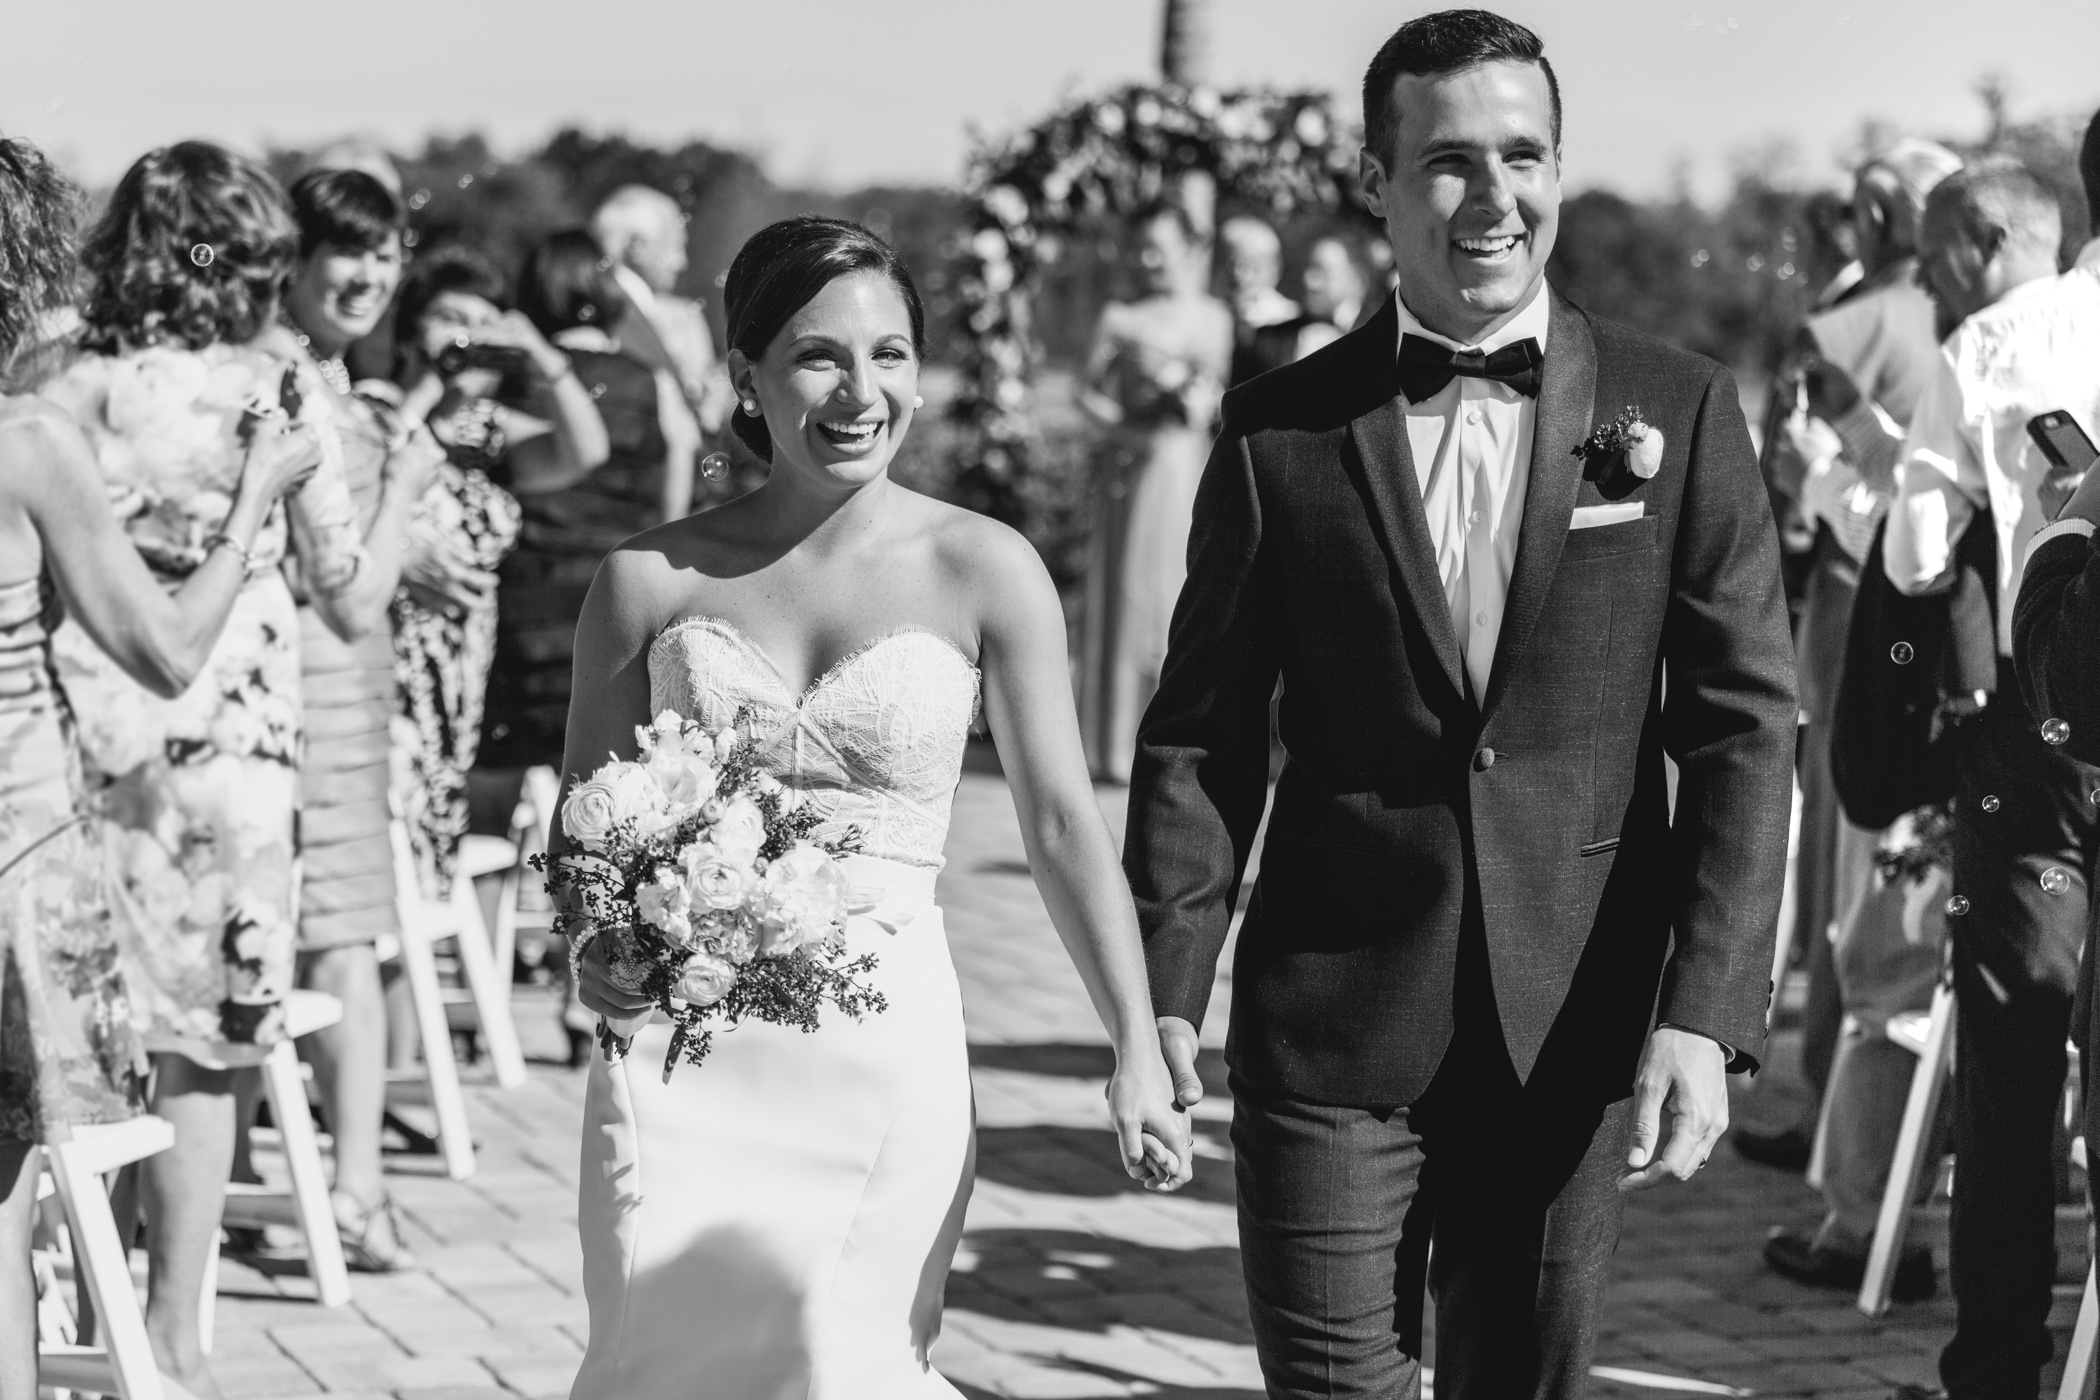 David & Allie - Shingle Creek Wedding Sneak Peek Spring 2016 - Web 13.jpg